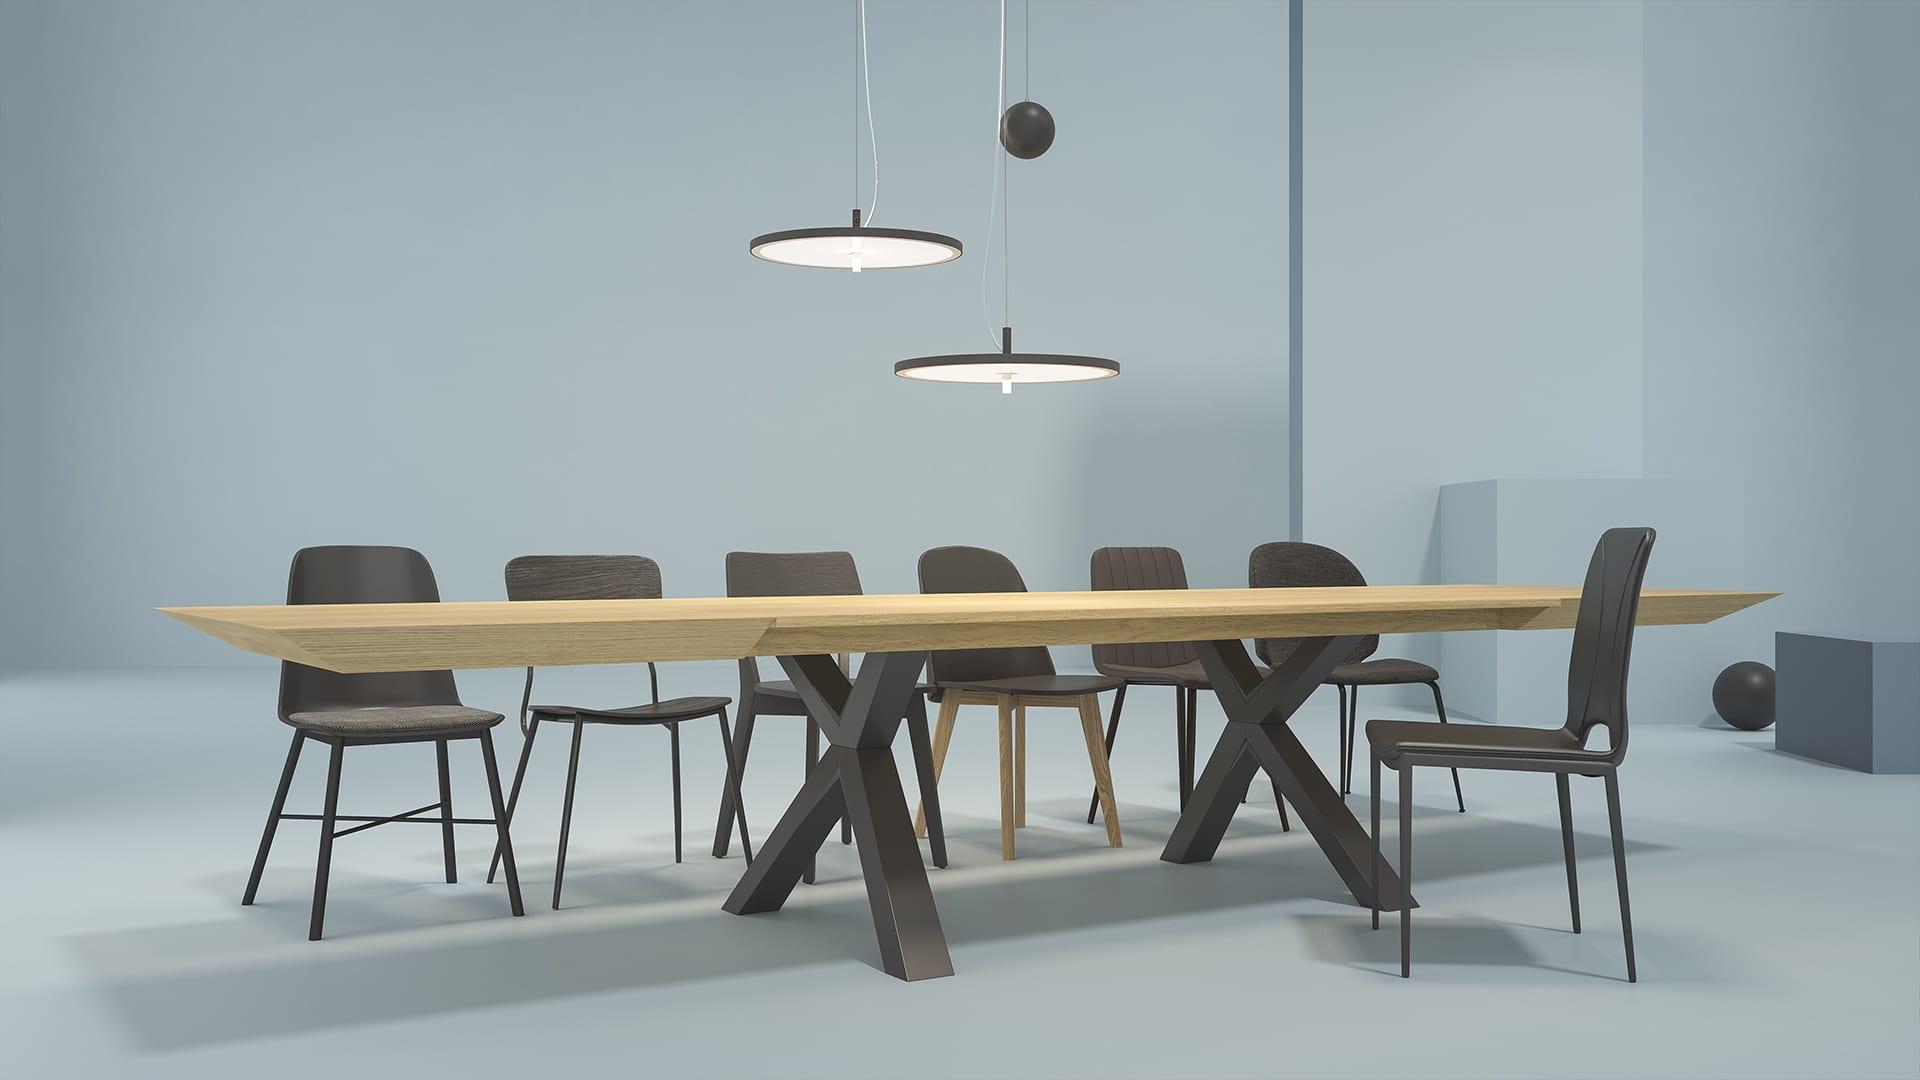 Maayan-Golan_Architectural-Visualization_3d-product-visualization_zaga-dining_12